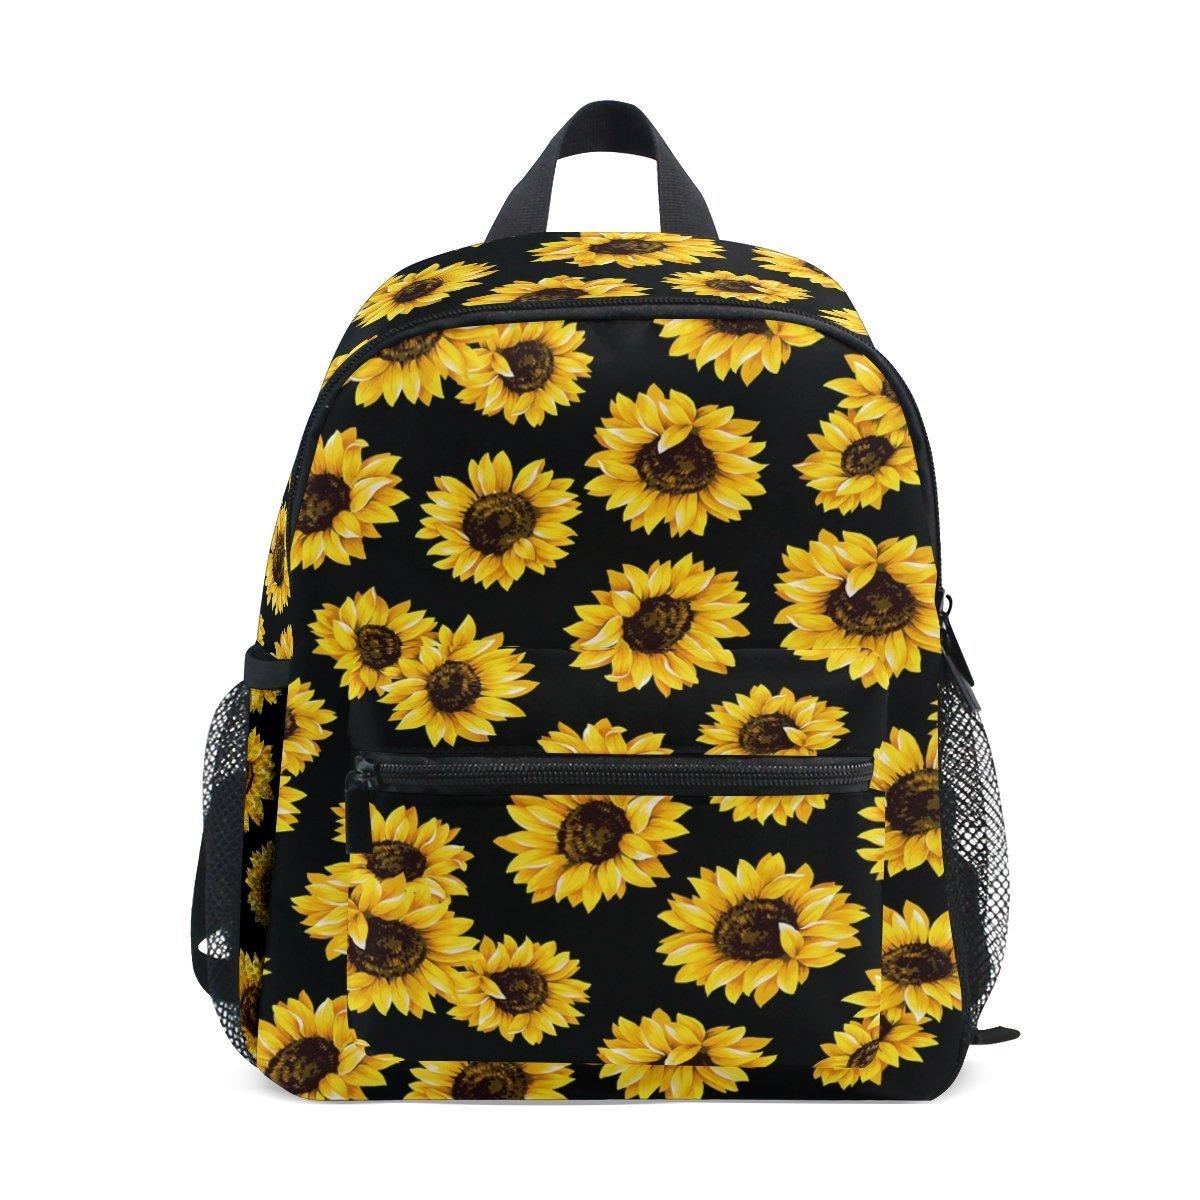 WAMIKAひまわり花柄Pre School子供キッズ学生の断熱幼児バックパック、ブラックの花12」スクールバッグ男の子女の子   B07G23LC9M